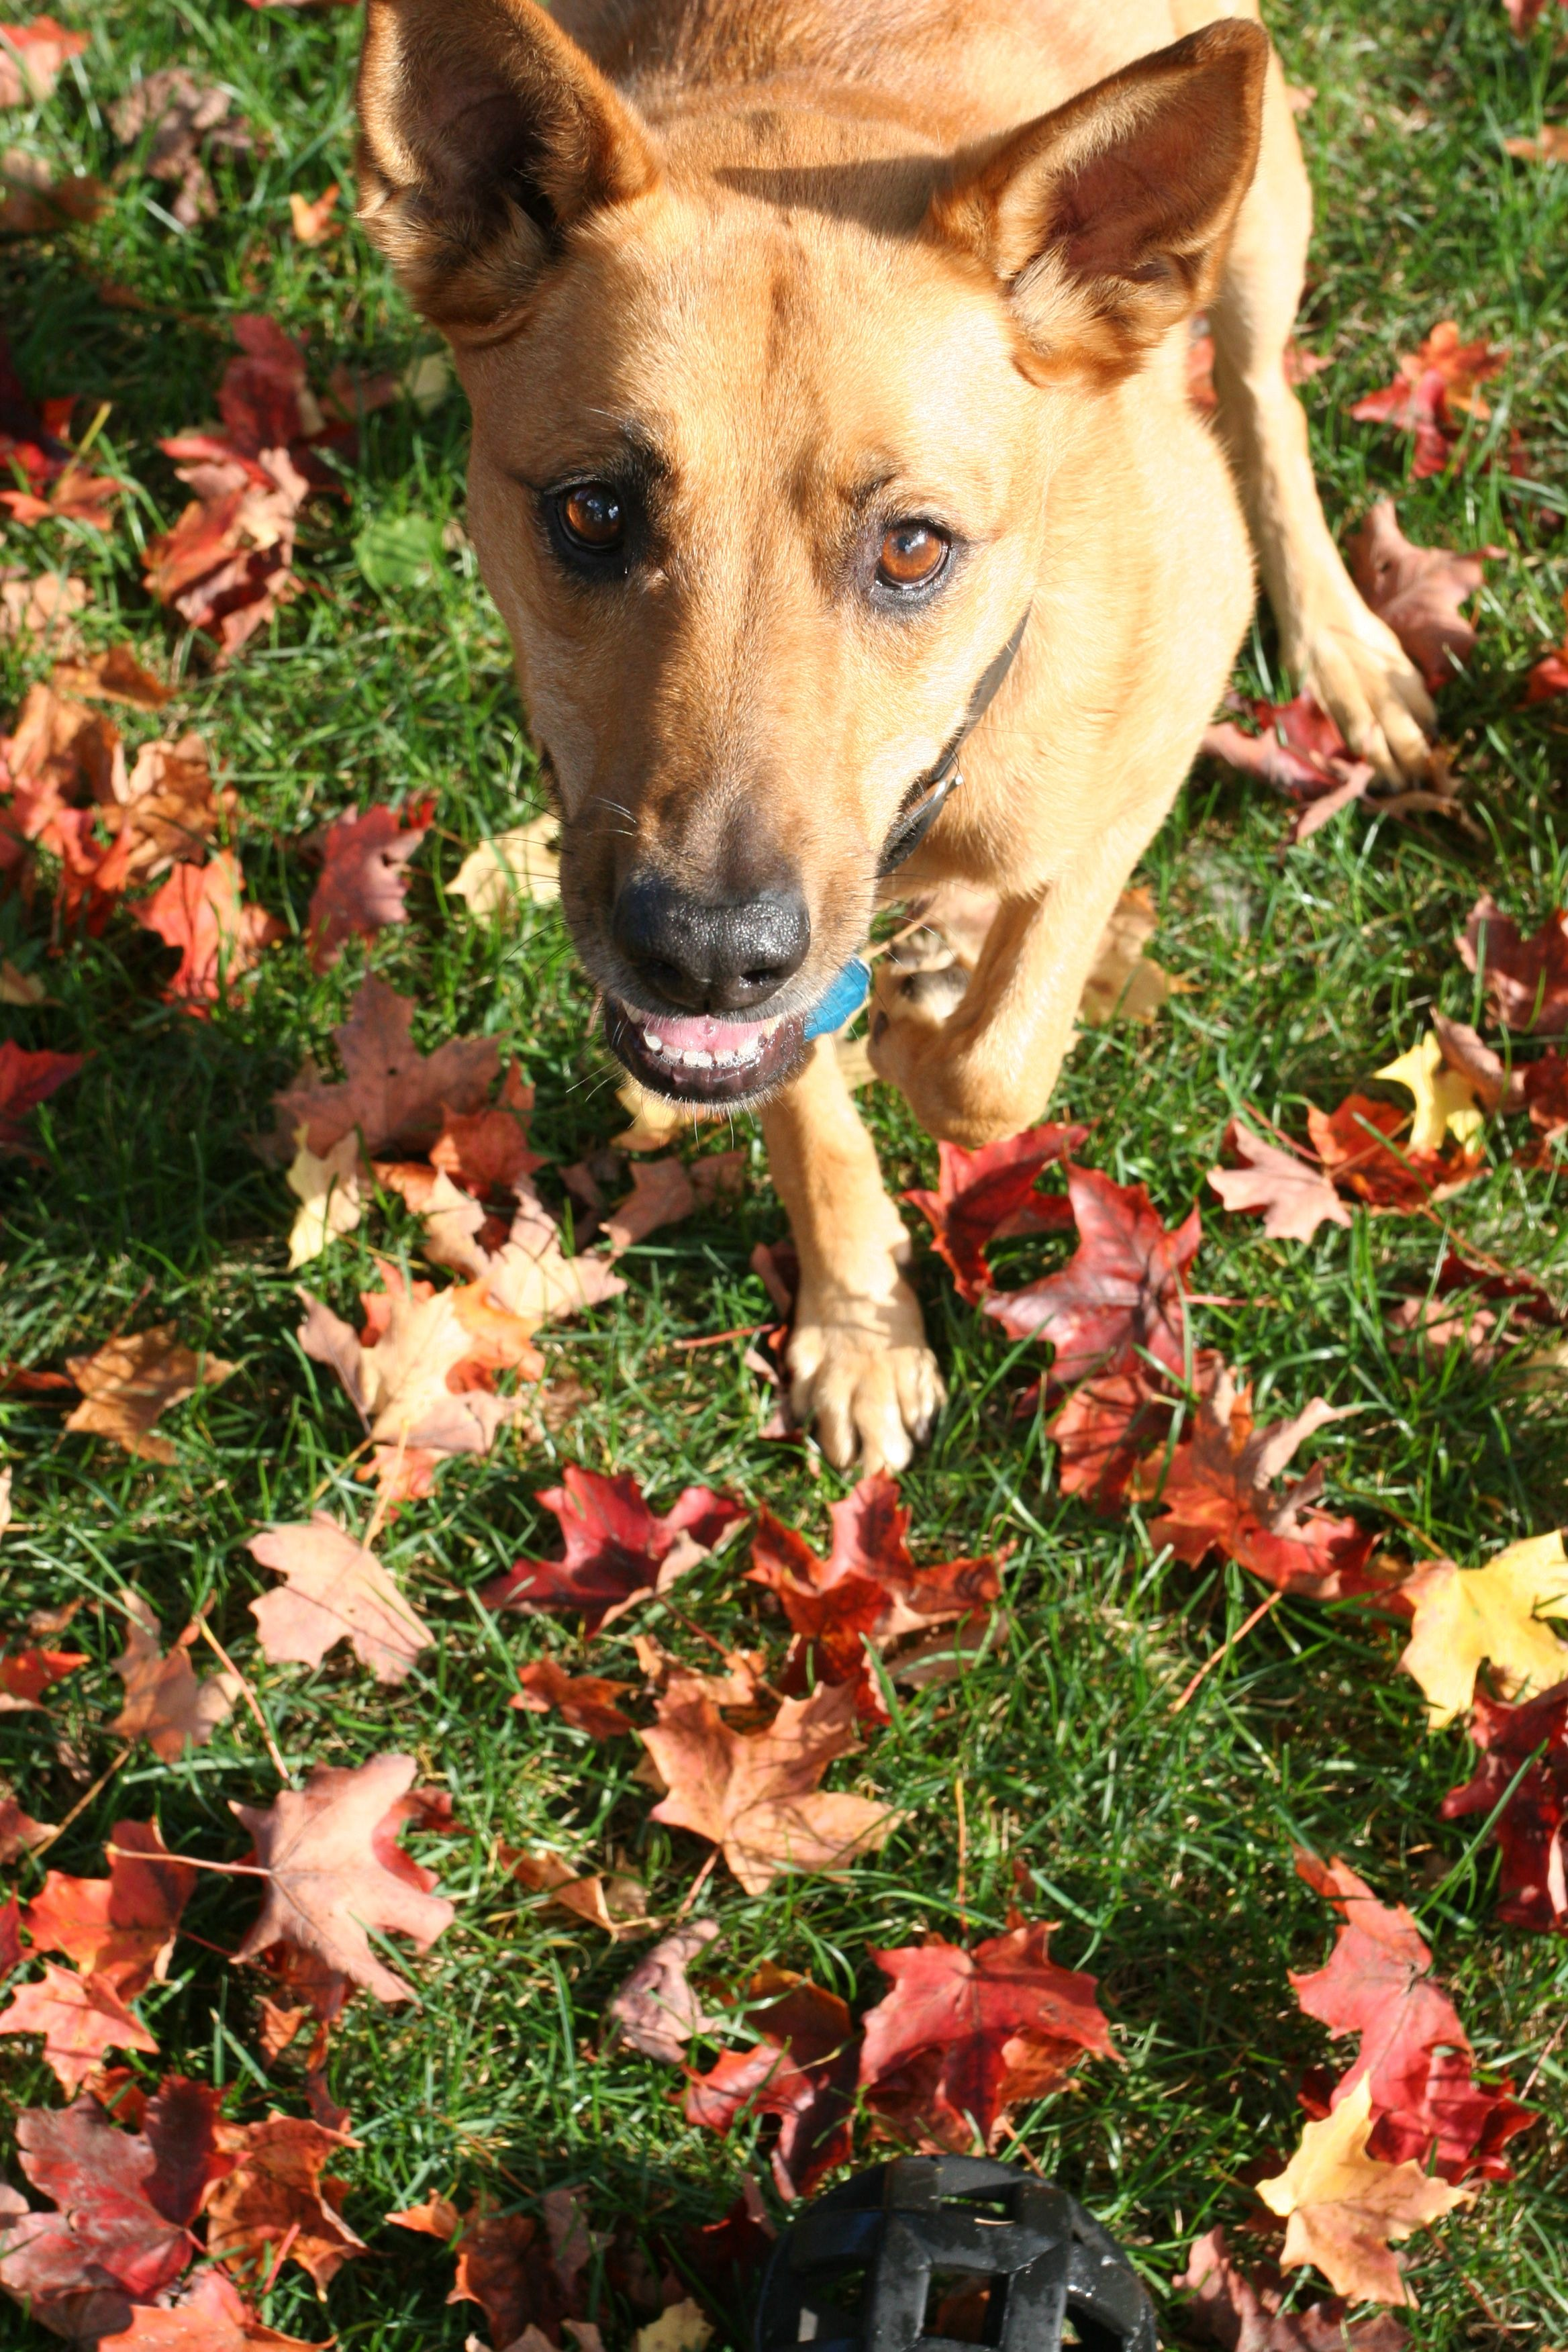 Beauty shot: the beast, in her autumnal habitat.